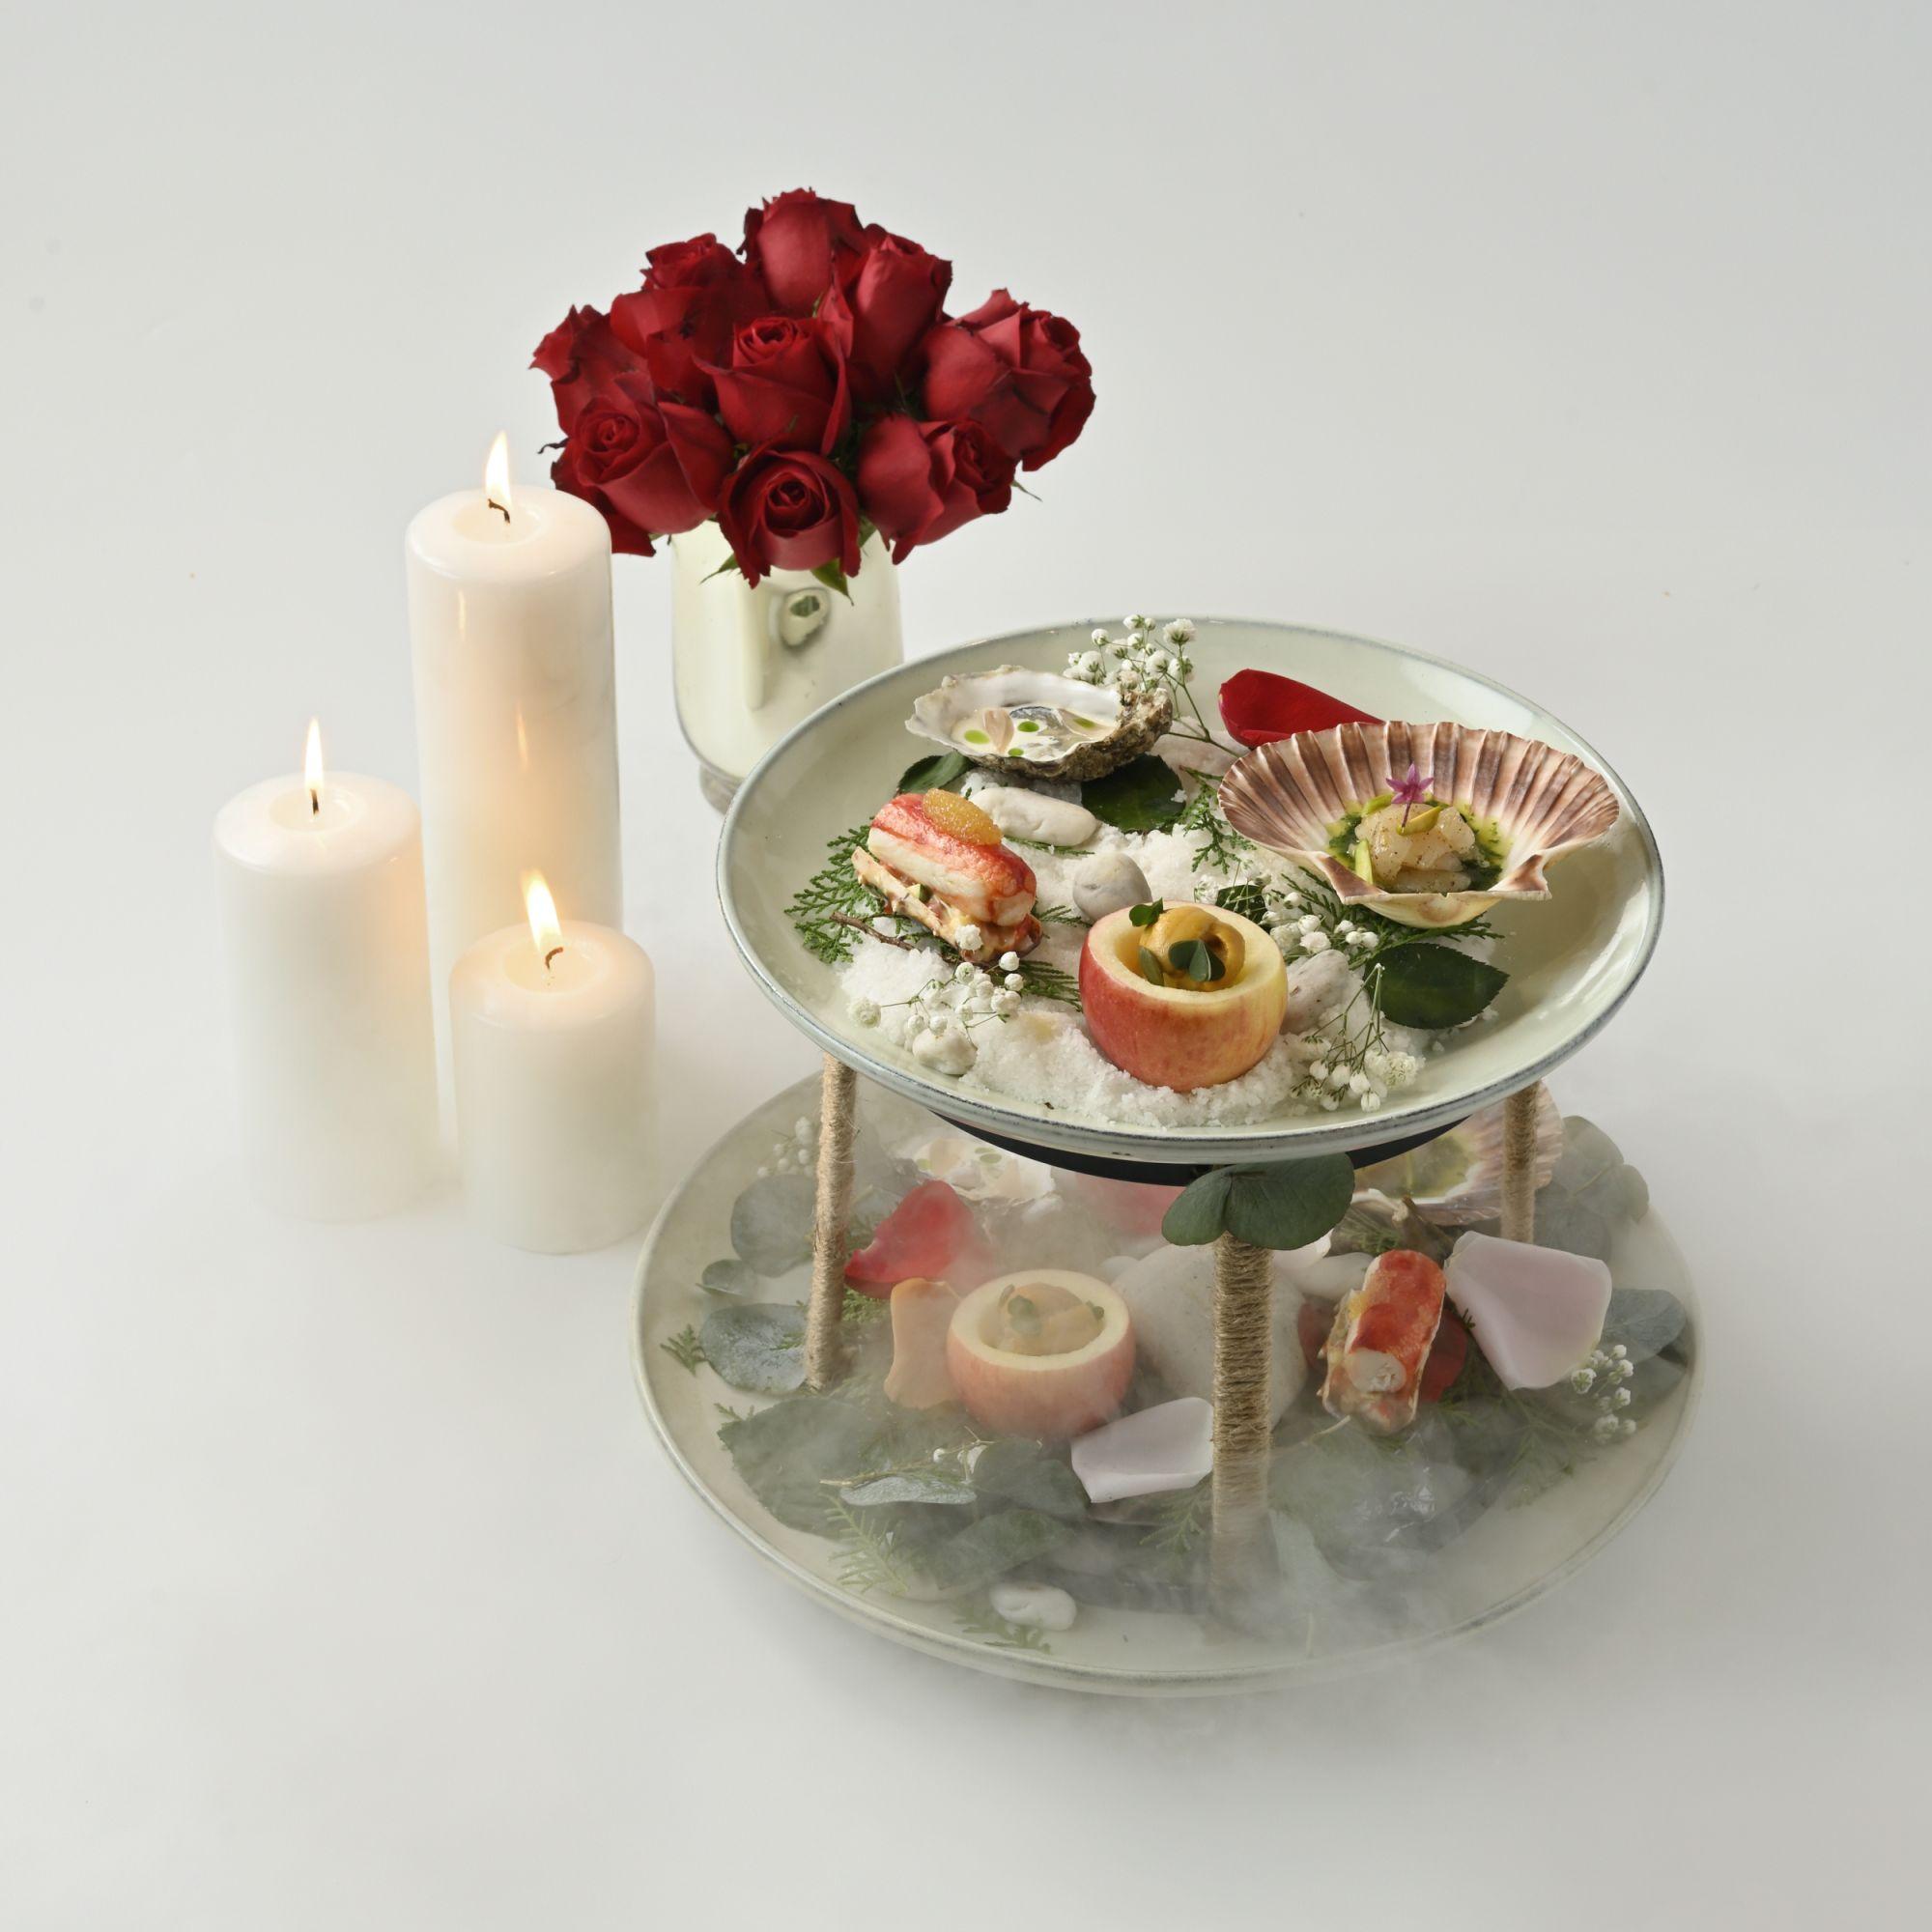 Celebrate True Love At The Mandarin Oriental This Valentine's Day 2021